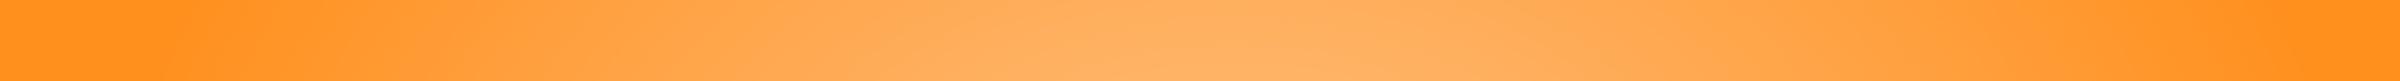 OrangeBackSM2